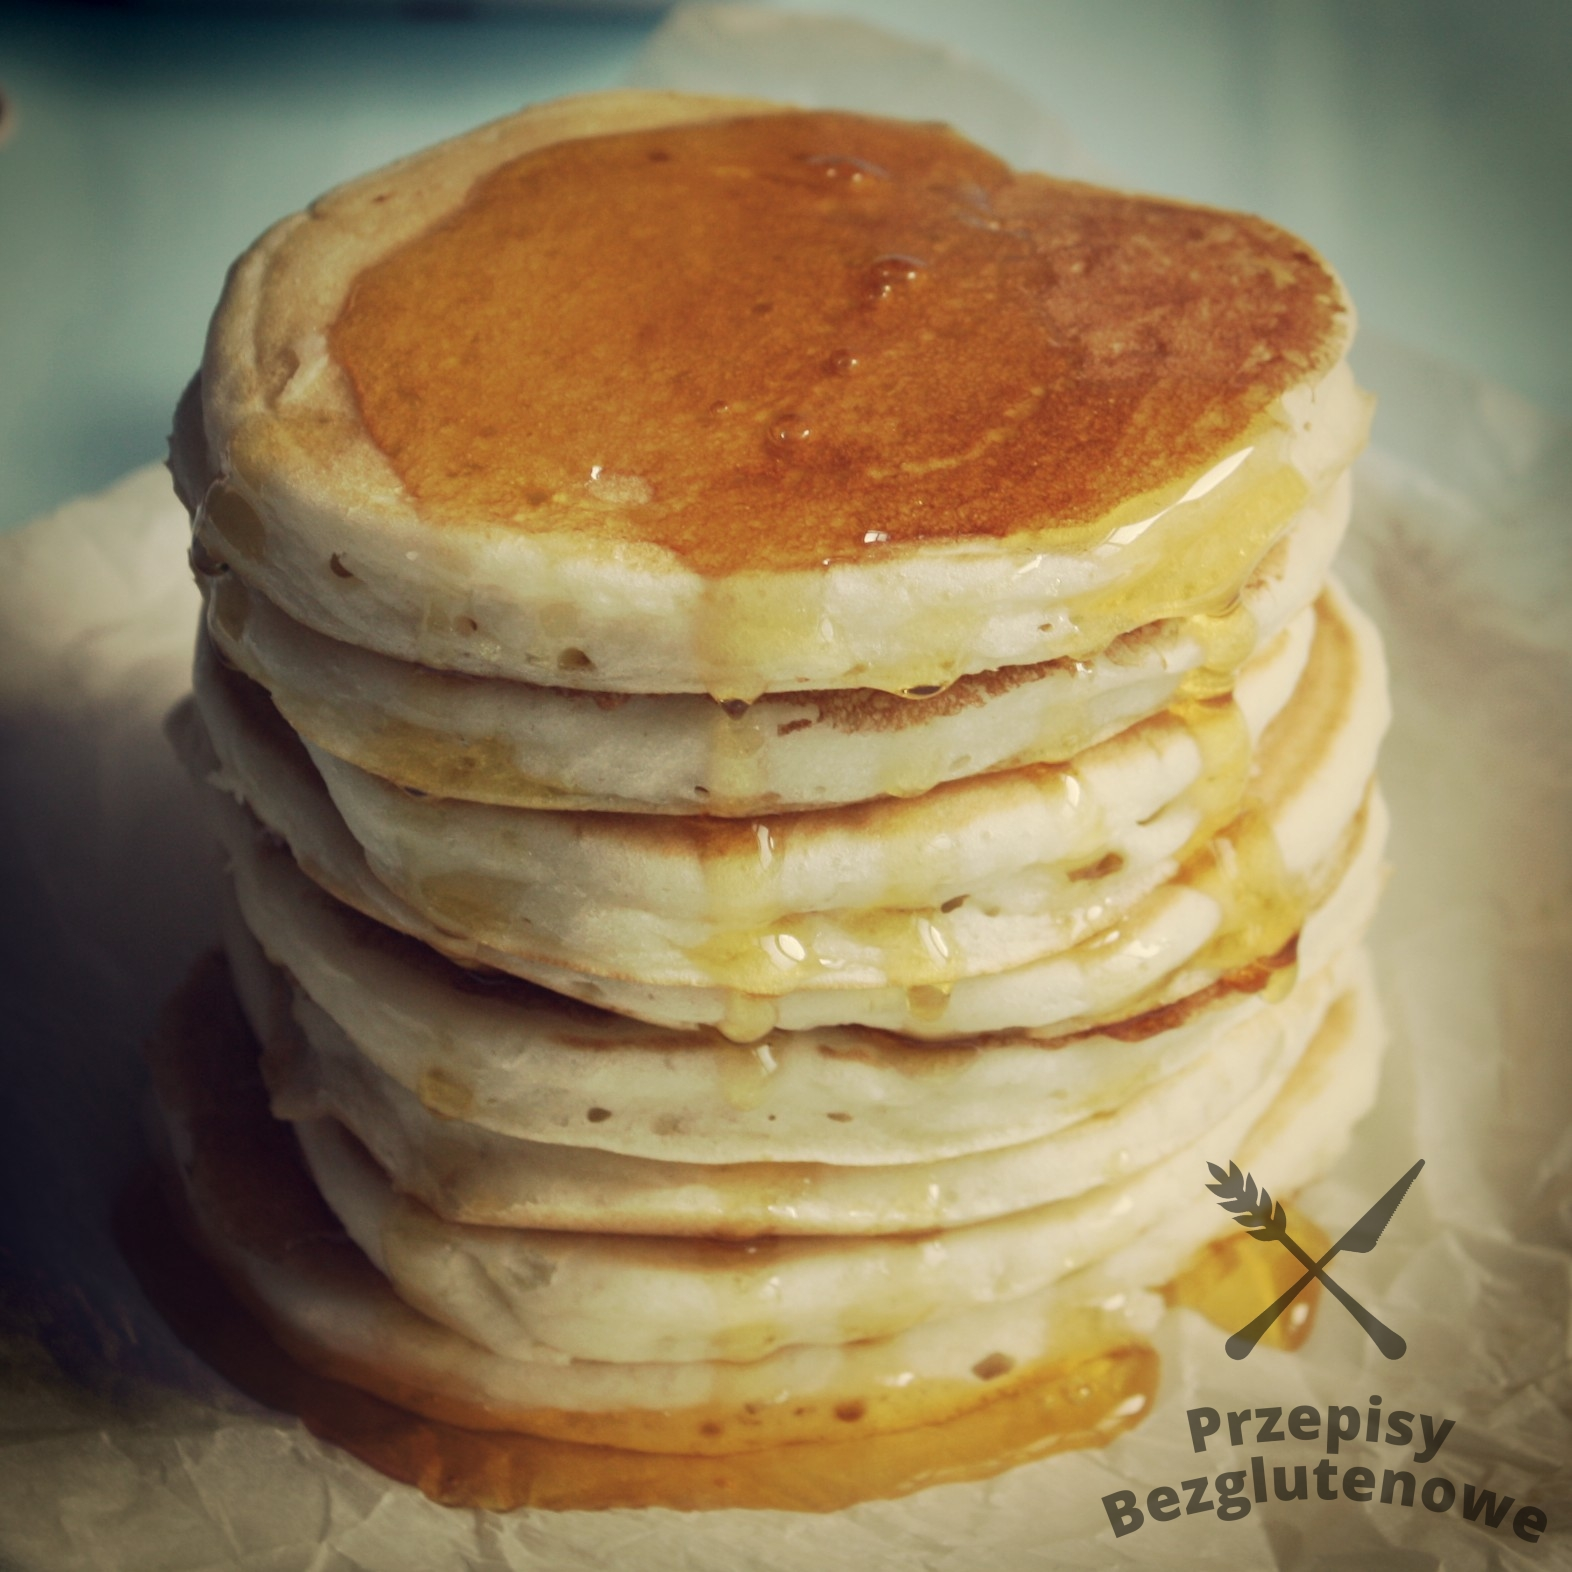 Bezglutenowe American pancakes